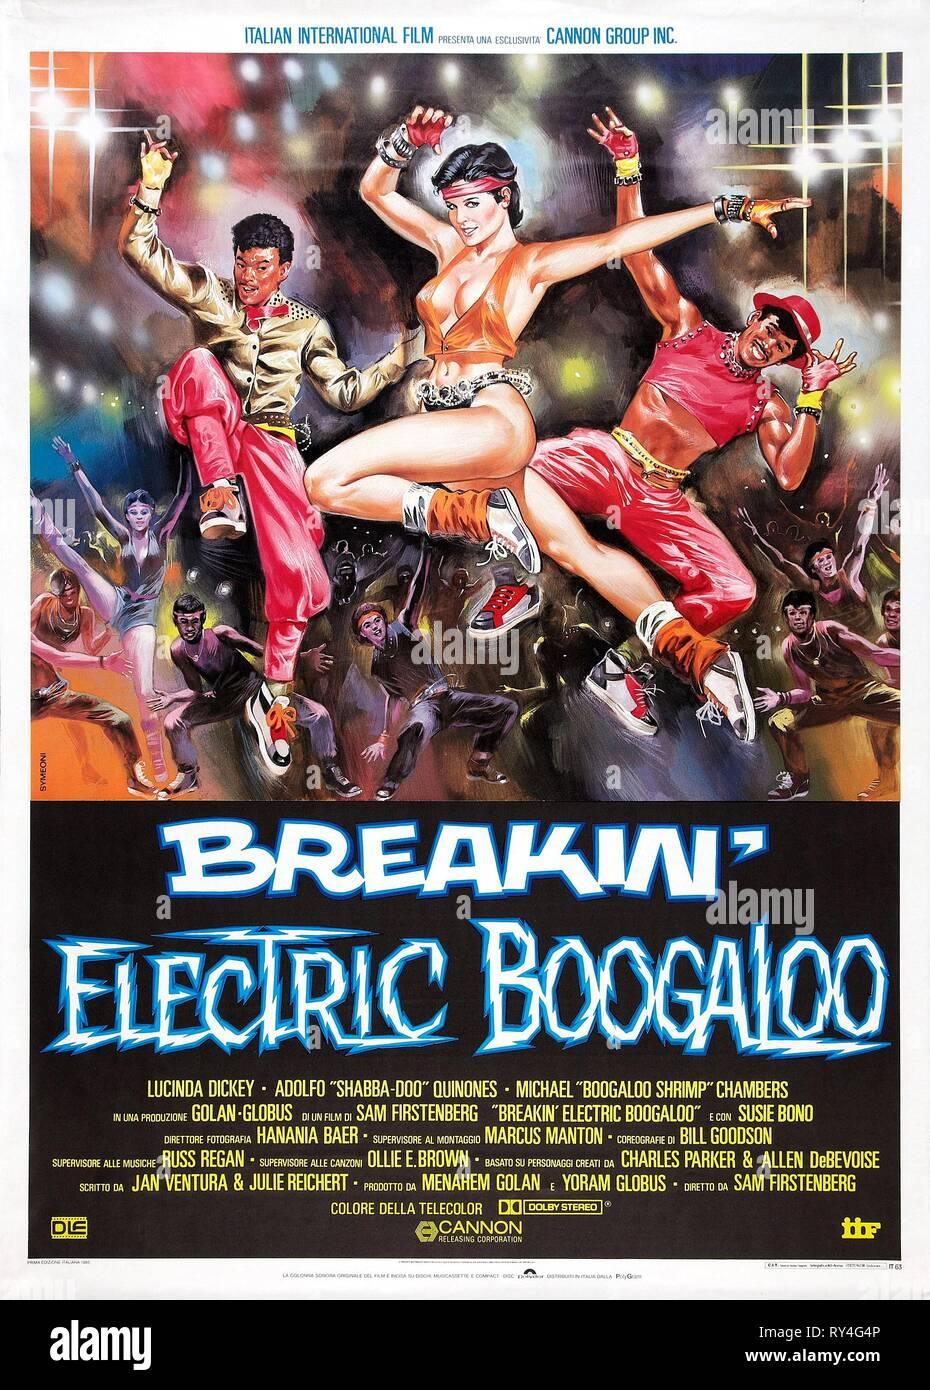 MICHAEL CHAMBERS, LUCINDA DICKEY,ADOLFO QUINONES POSTER, BREAKIN' 2: ELECTRIC BOOGALOO, 1984 - Stock Image